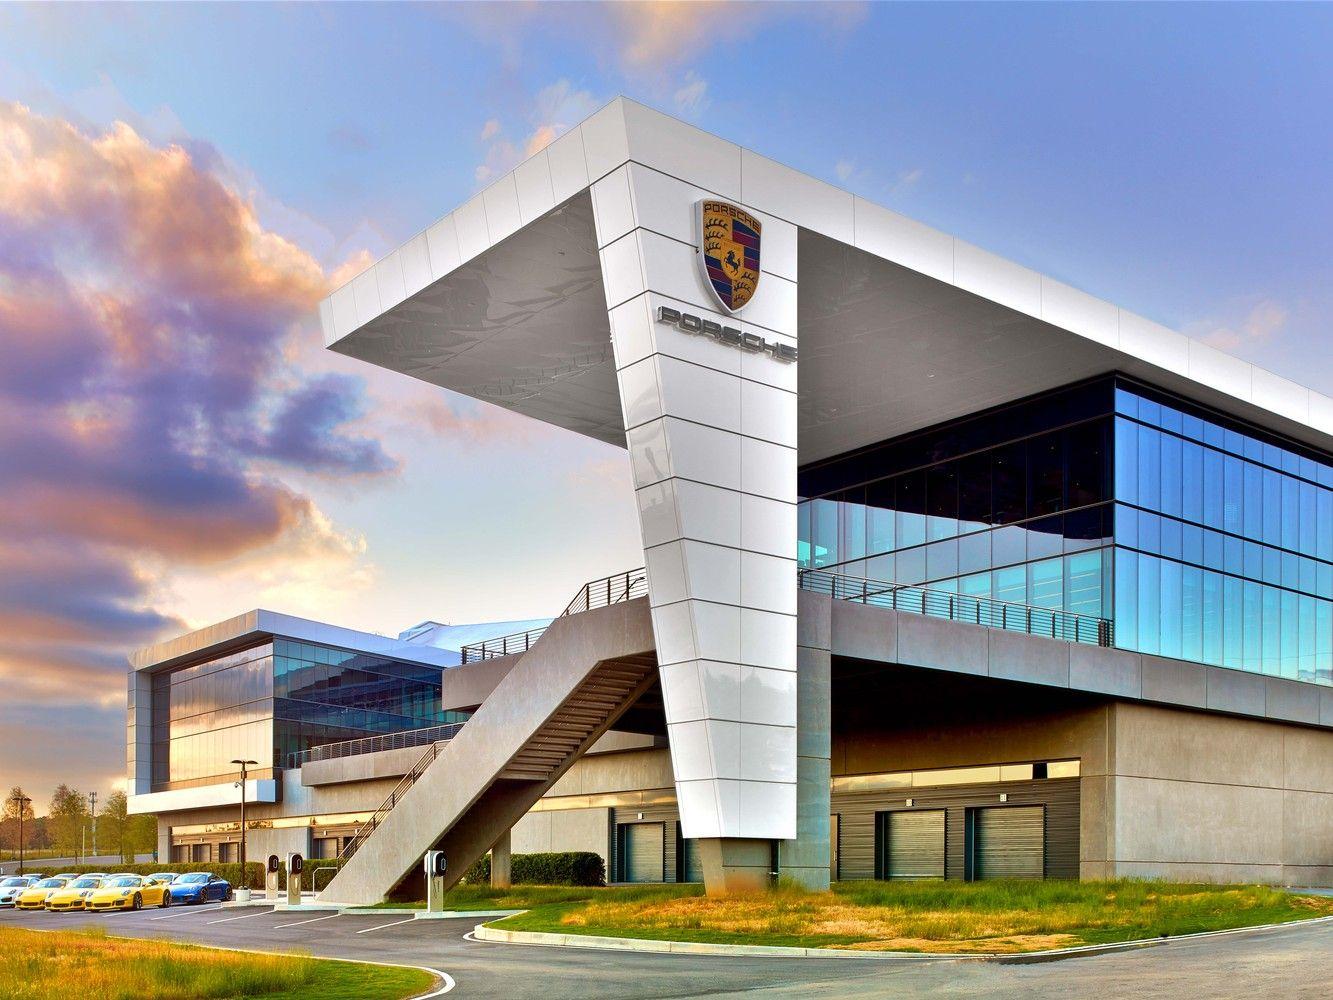 Gallery Of Porsche North America Experience Center And Headquarters Hok 6 Experience Center Porsche Experience Church Interior Design